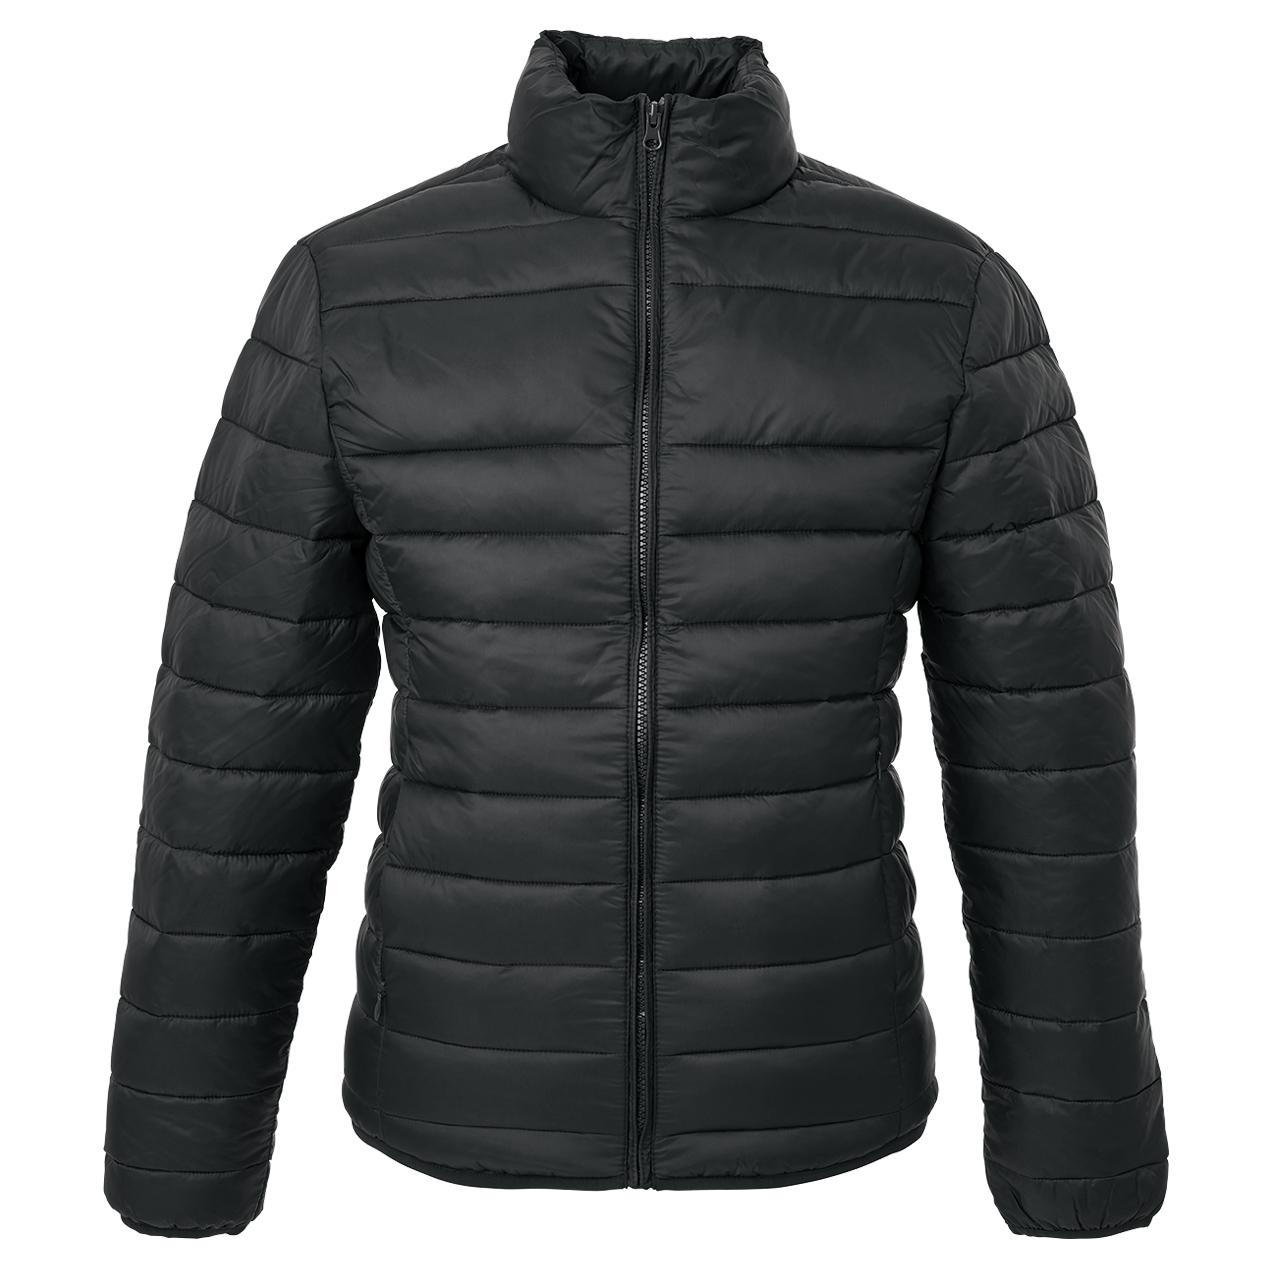 Promotional Women s Puffer Jackets  Branded Online  856964d966